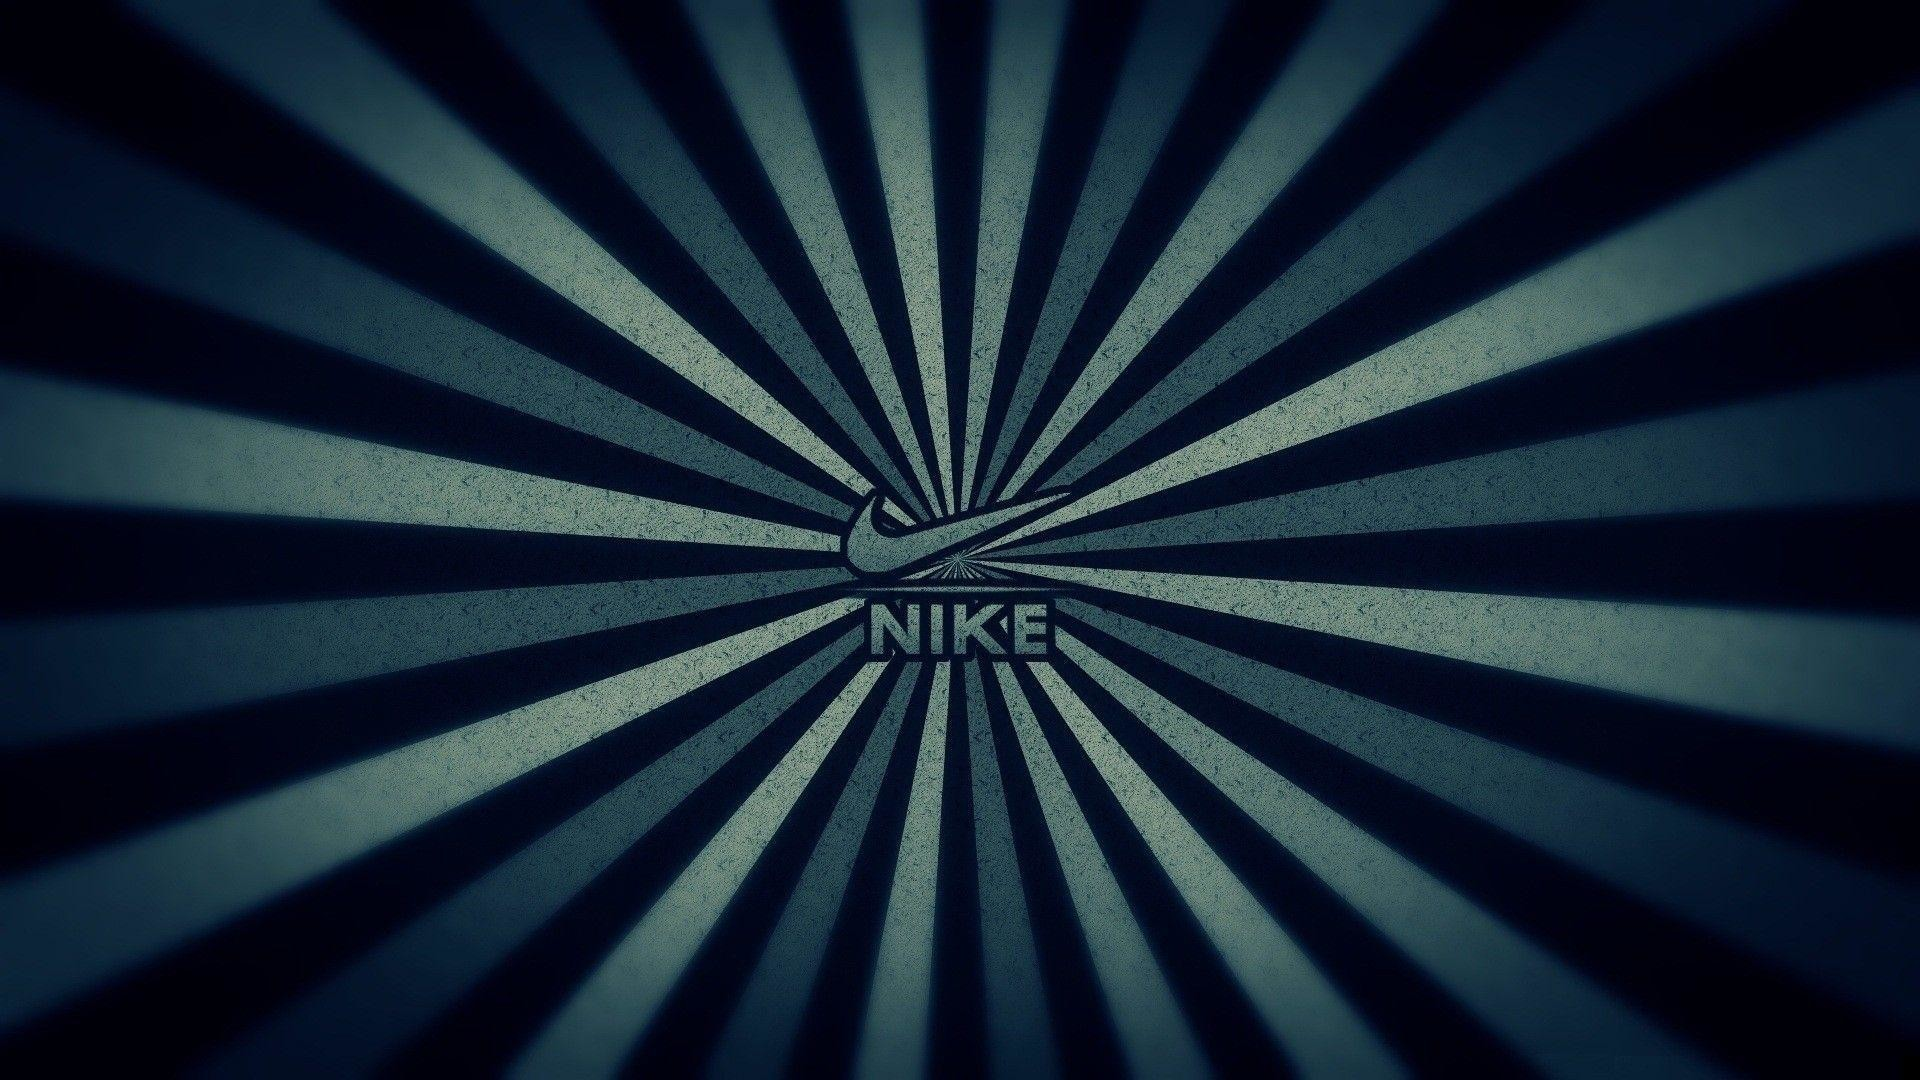 Best Nike Logo Stripes Wallpaper HD #1883   Hdwidescreens.